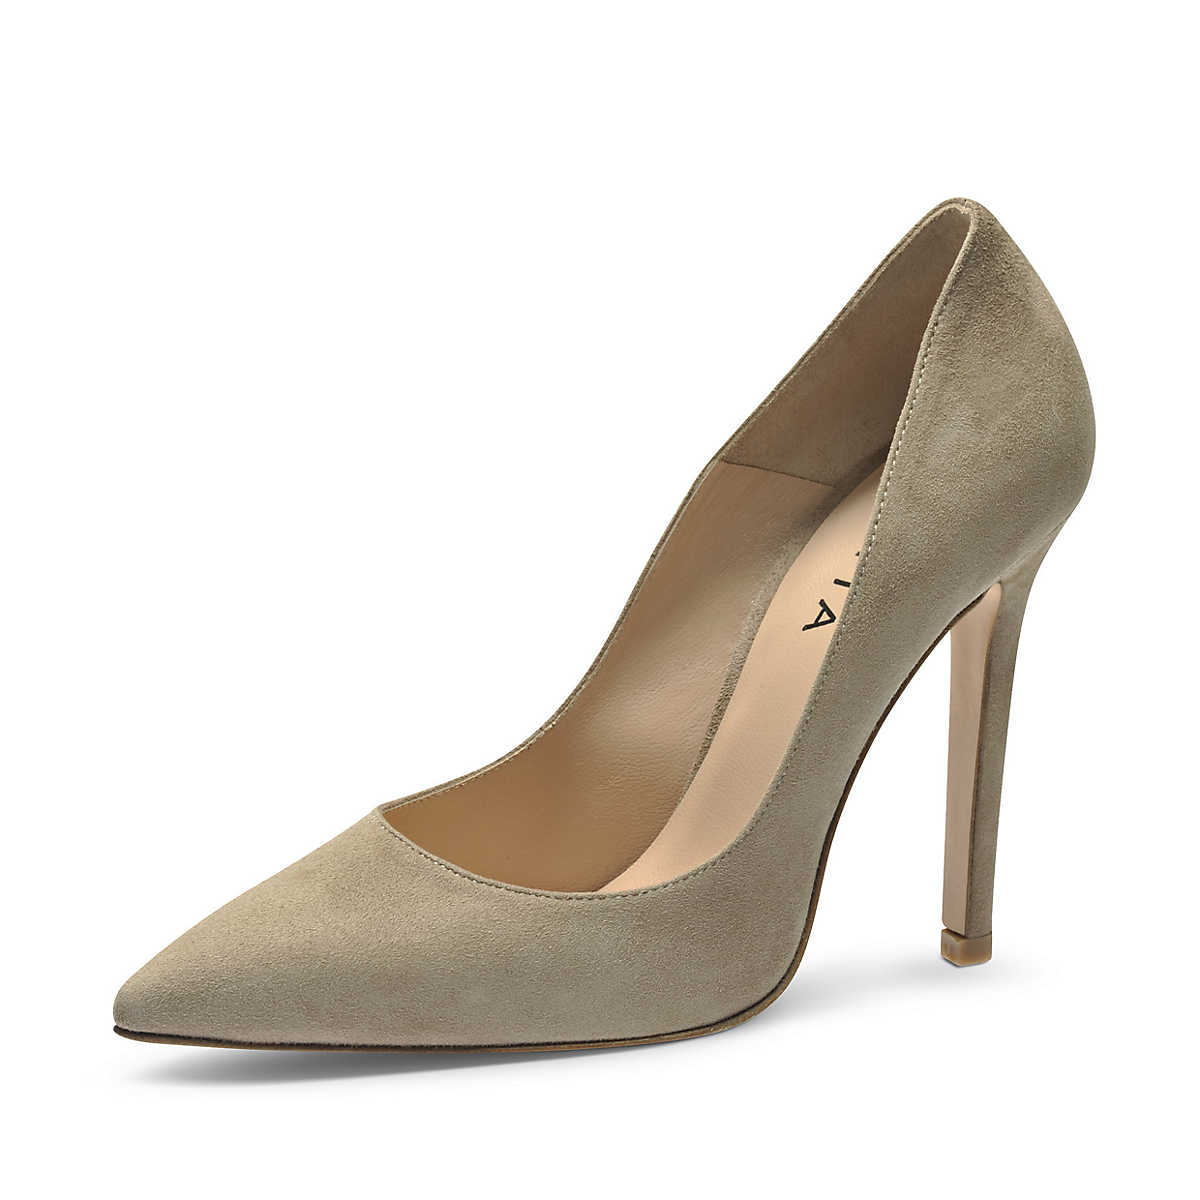 Evita Shoes Pumps grau - Evita Shoes - Pumps - Schuhe - mirapodo.de